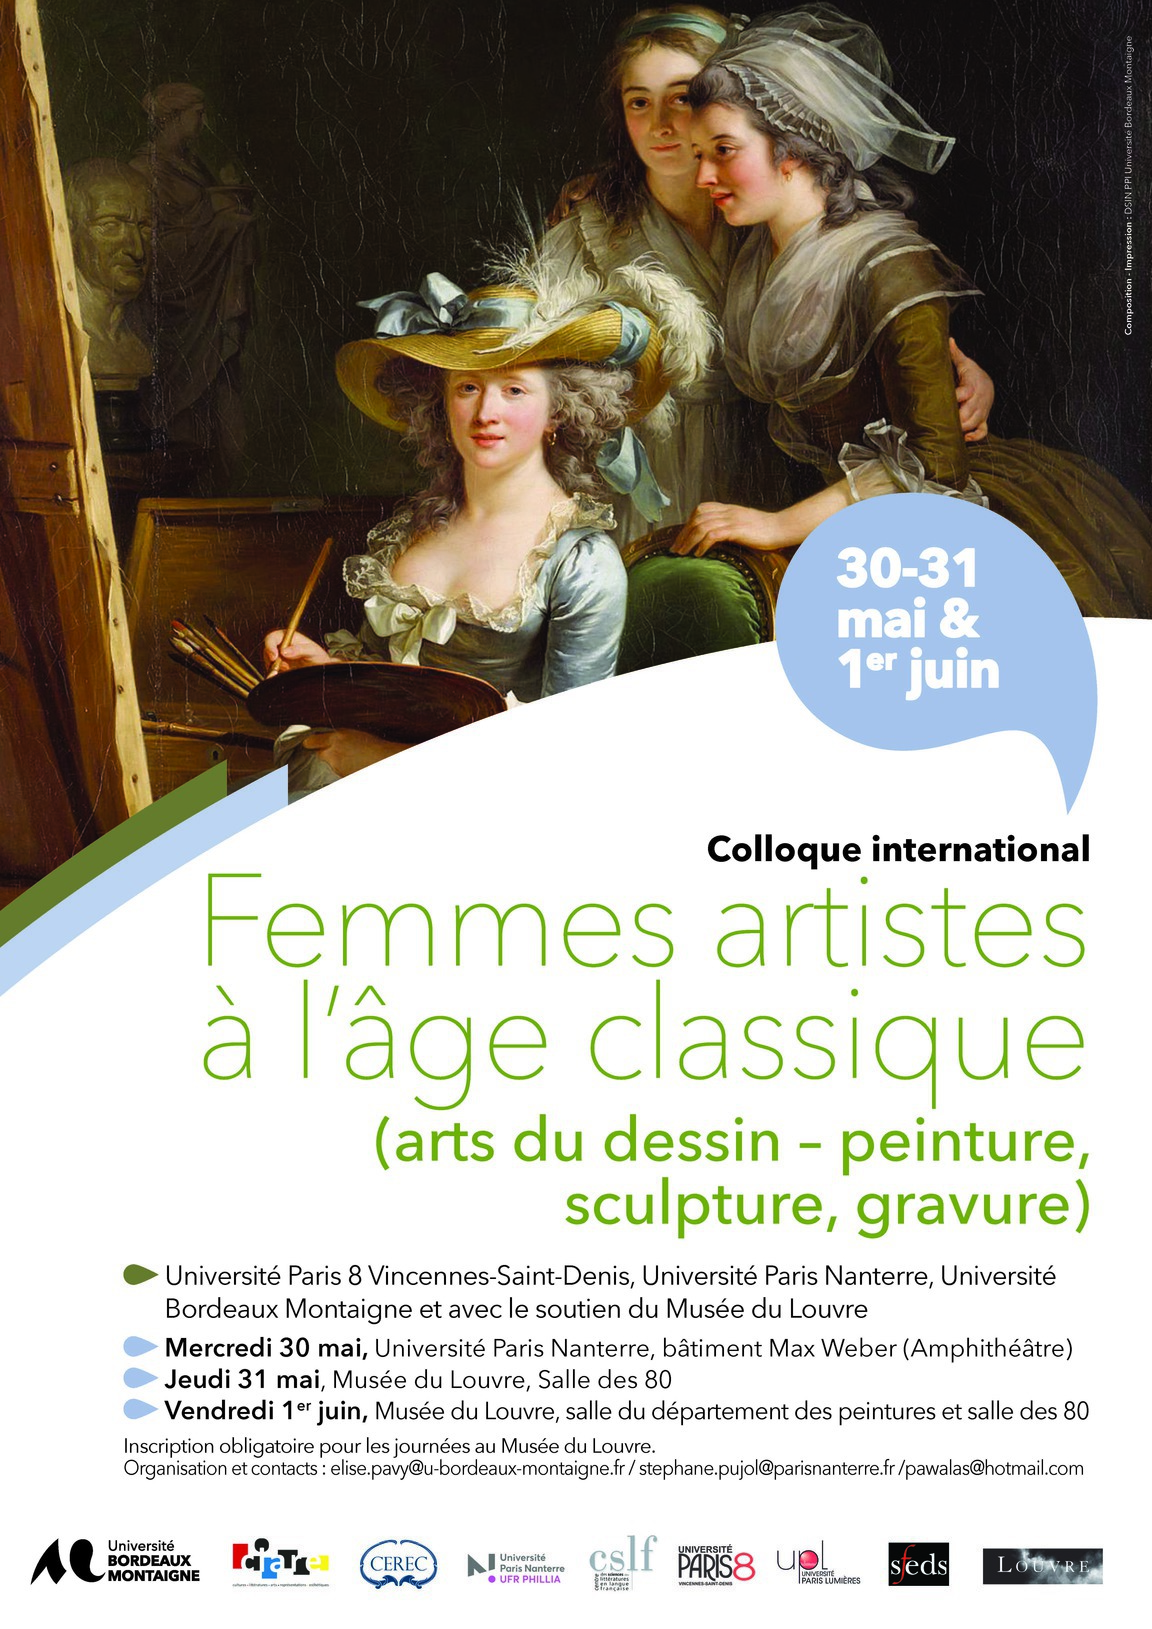 Affiche colloque Femmes artistes, Nanterre-Louvre, 30 mai-1er juin 2018